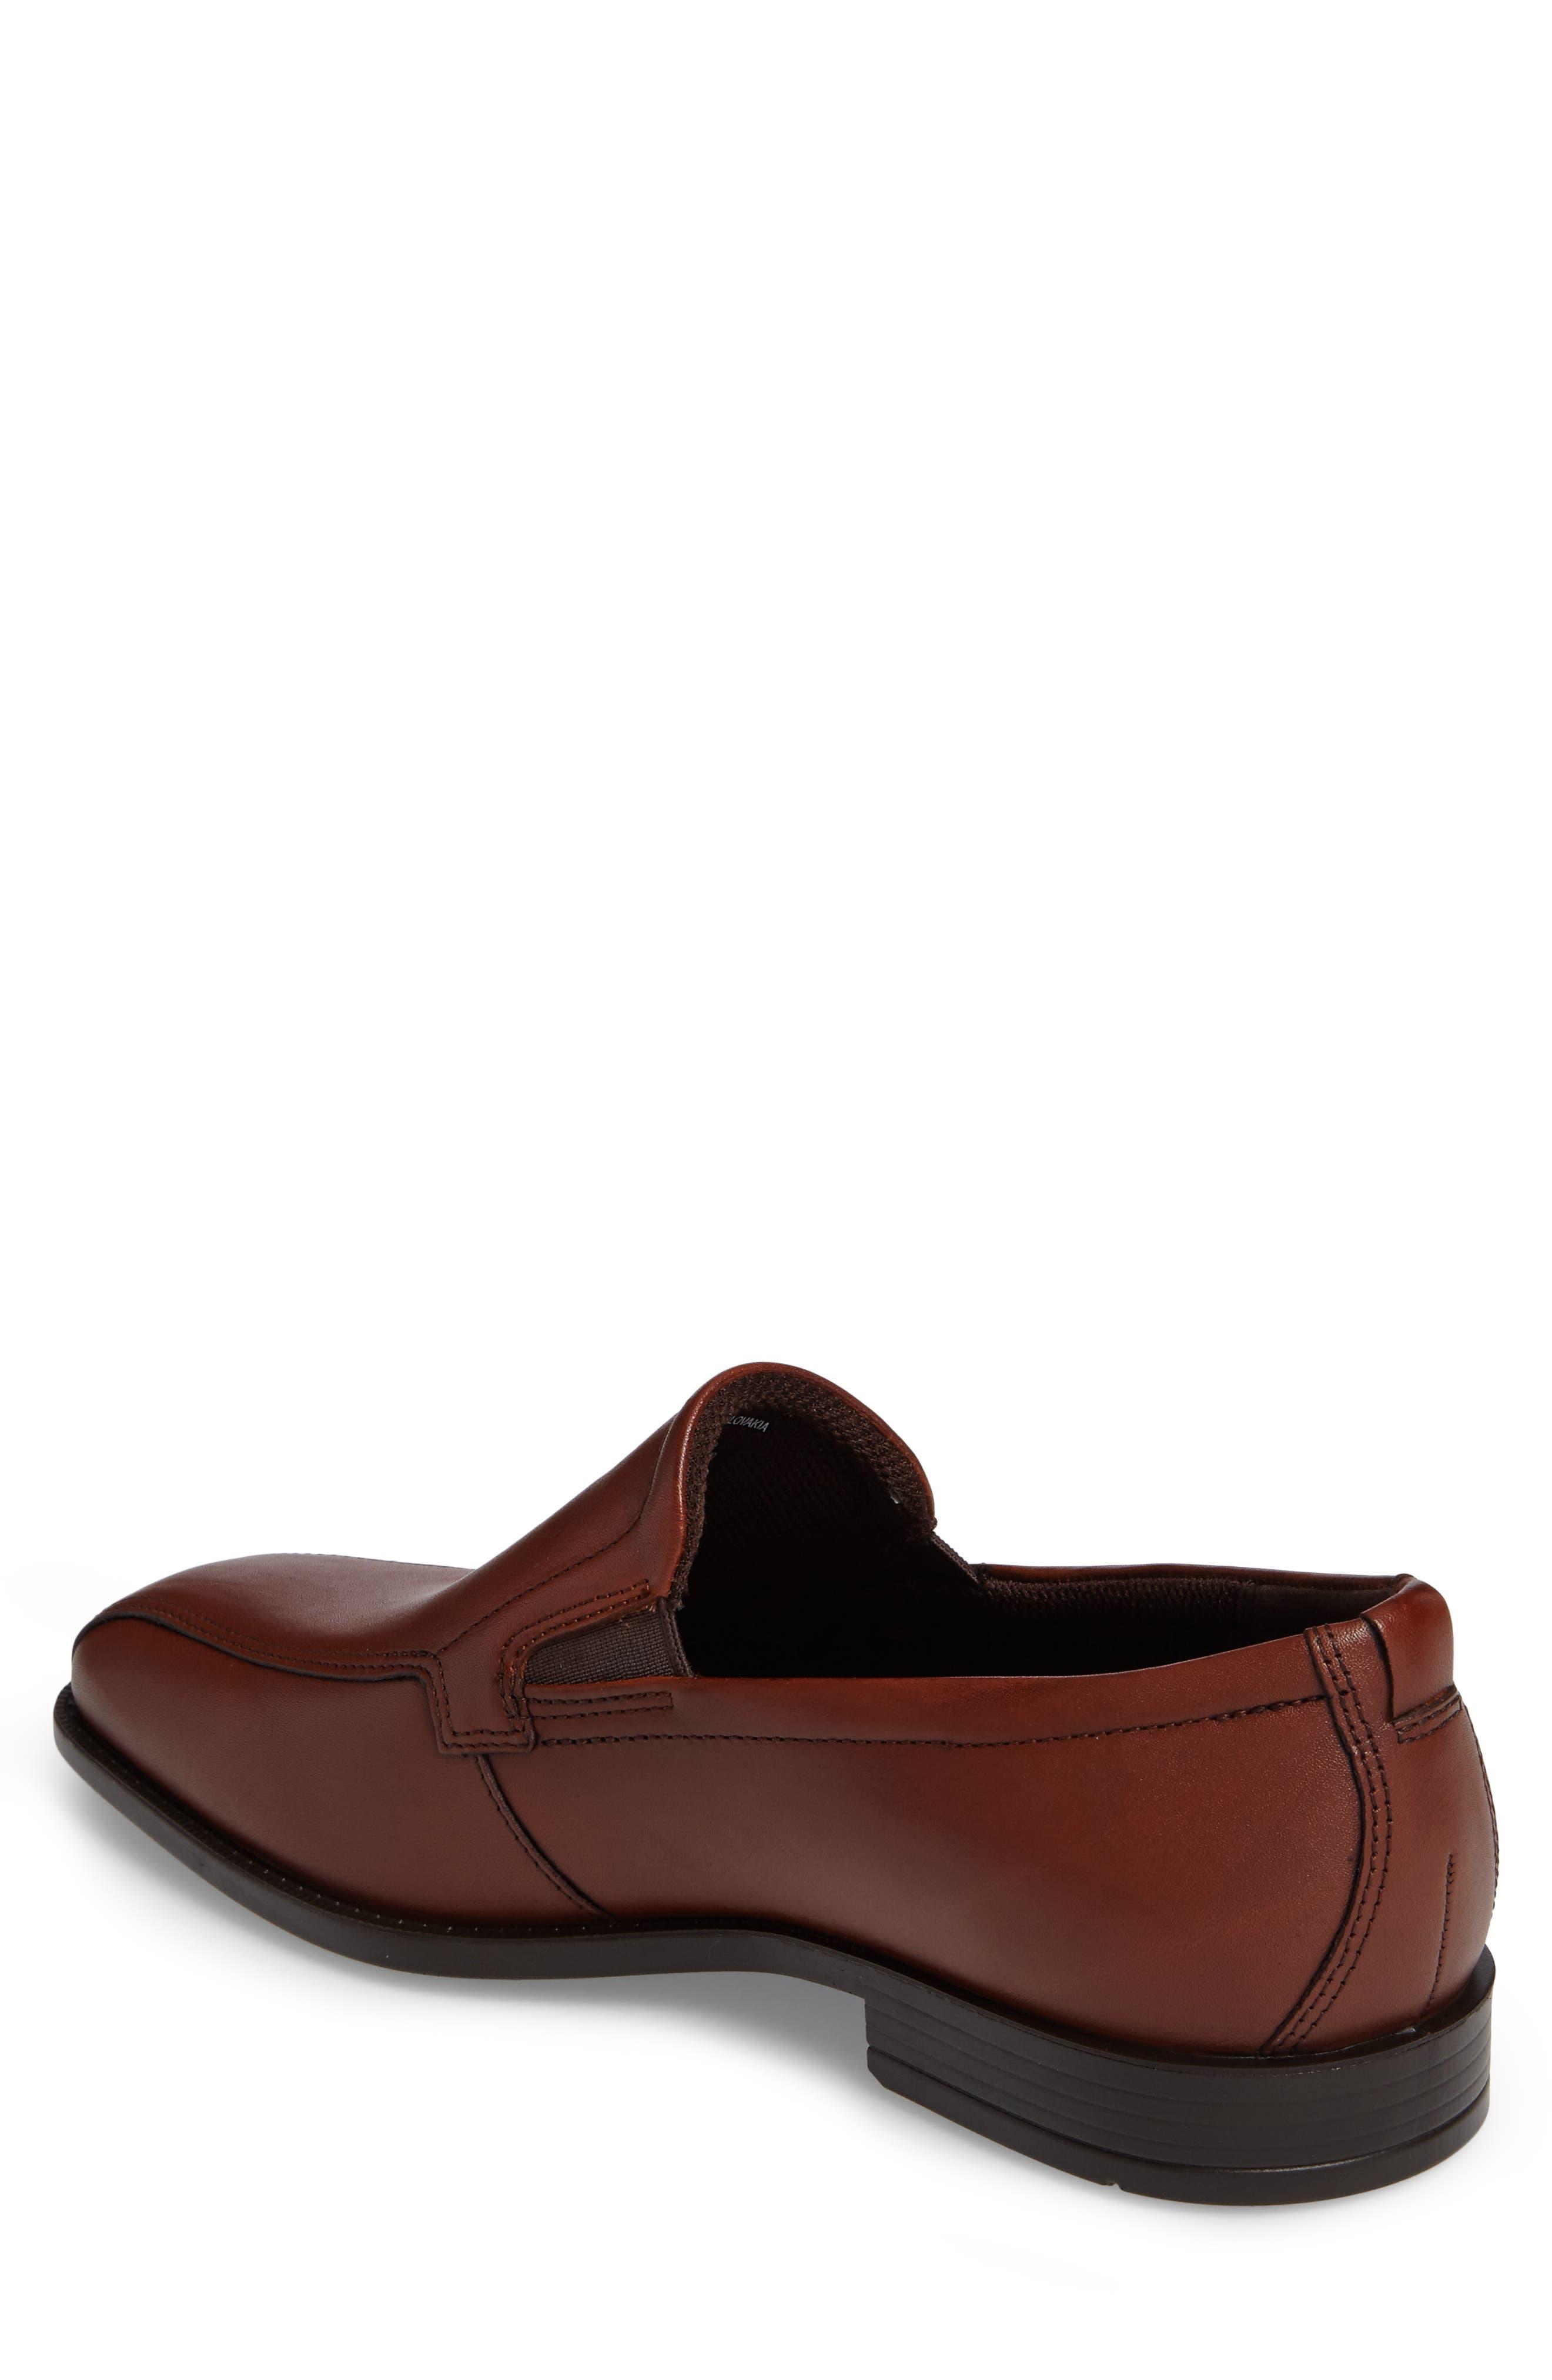 Edinburgh Venetian Loafer,                             Alternate thumbnail 2, color,                             Cognac Leather